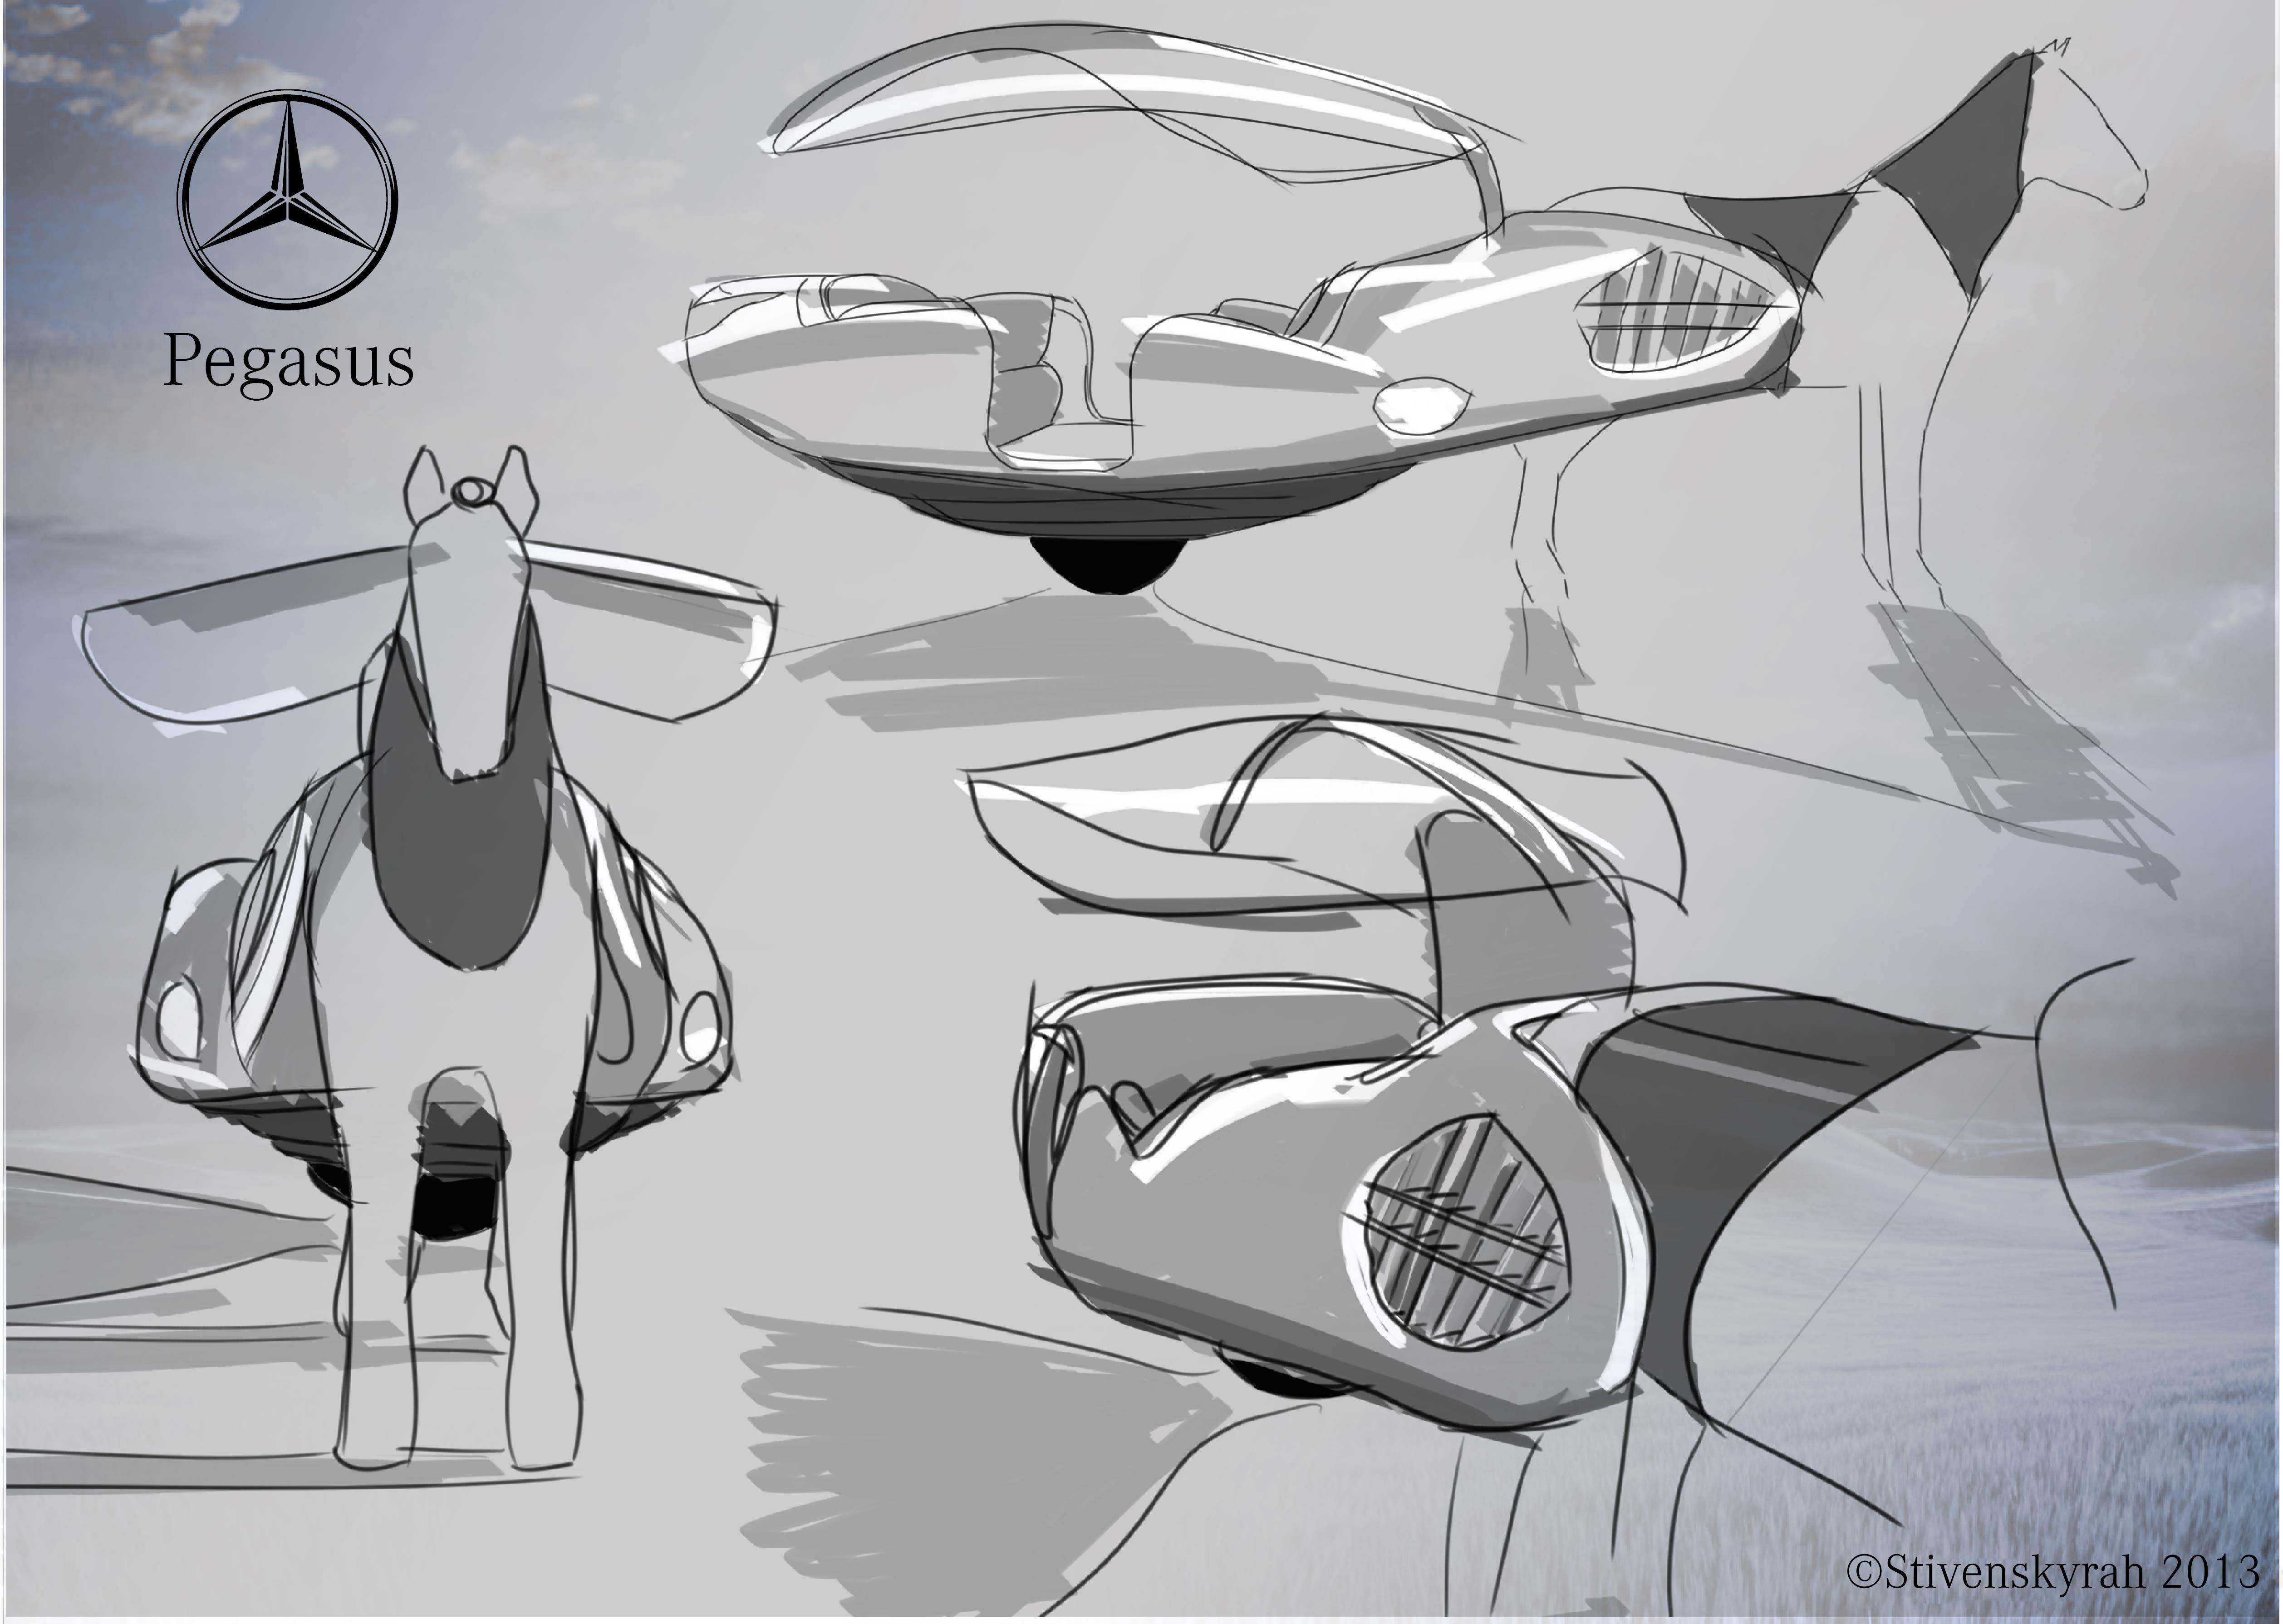 05-sketches-pegasus-stivenskyrah-designwithlove